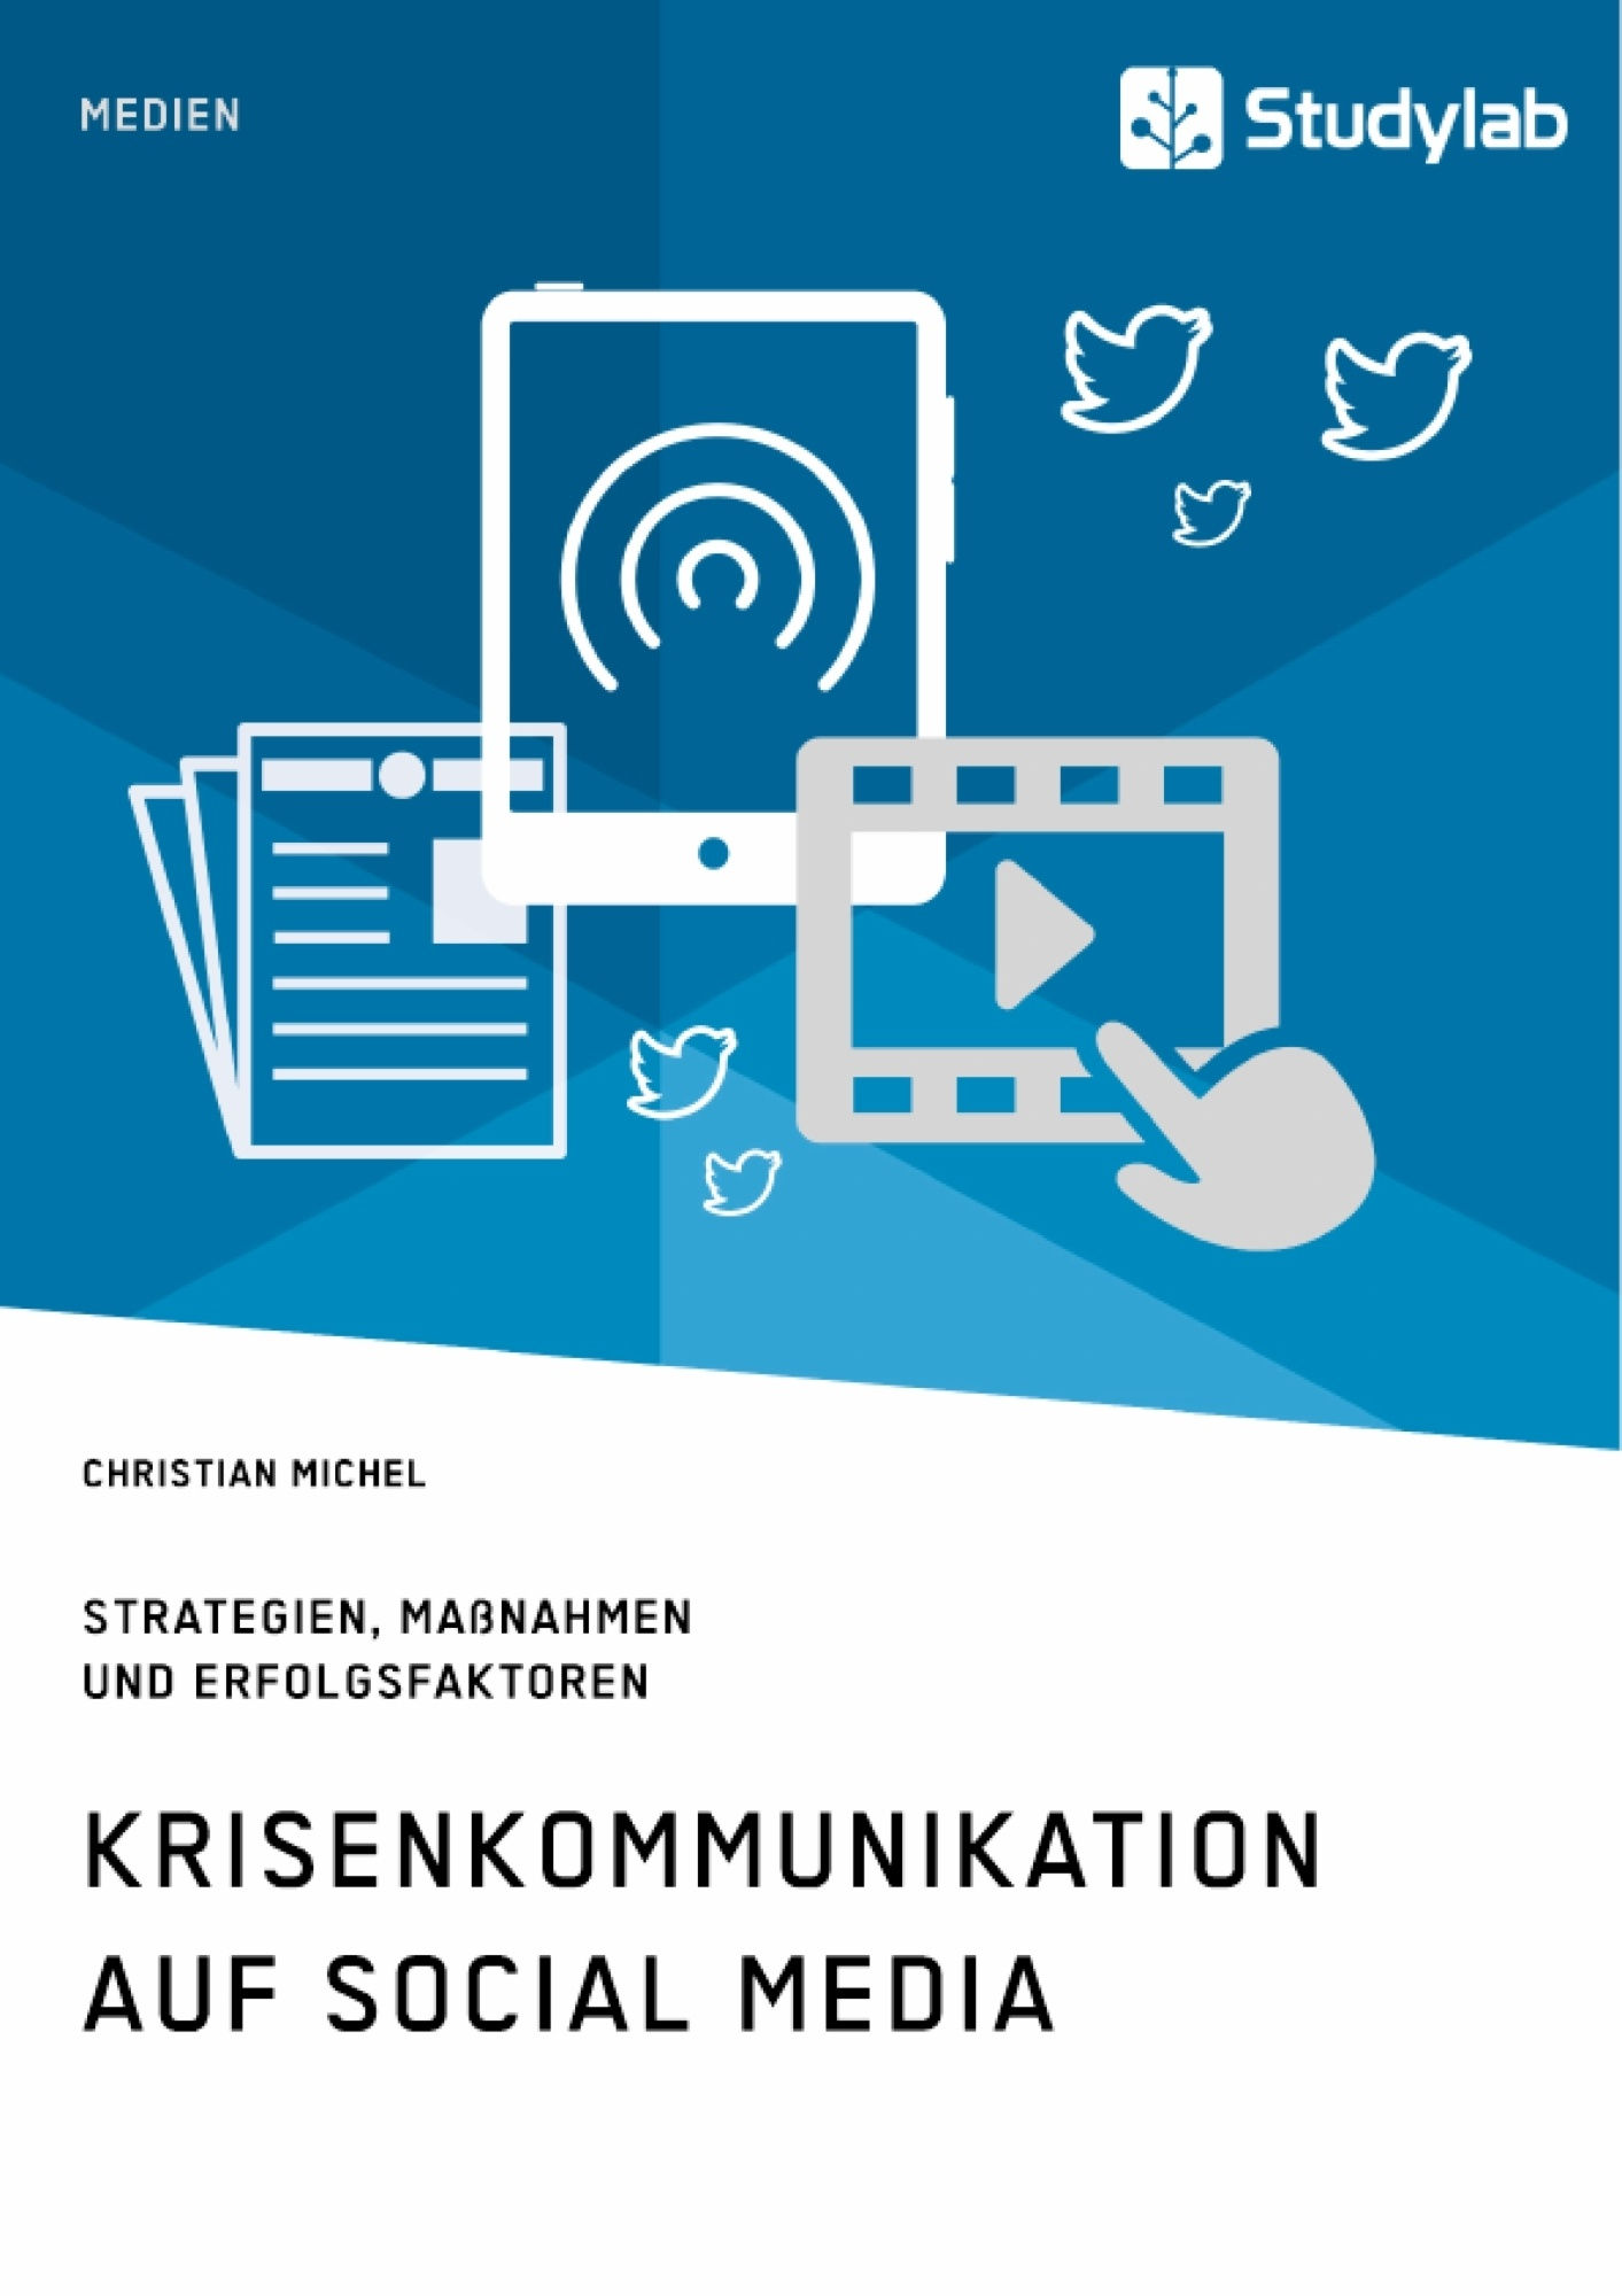 Titel: Krisenkommunikation auf Social Media. Strategien, Maßnahmen und Erfolgsfaktoren